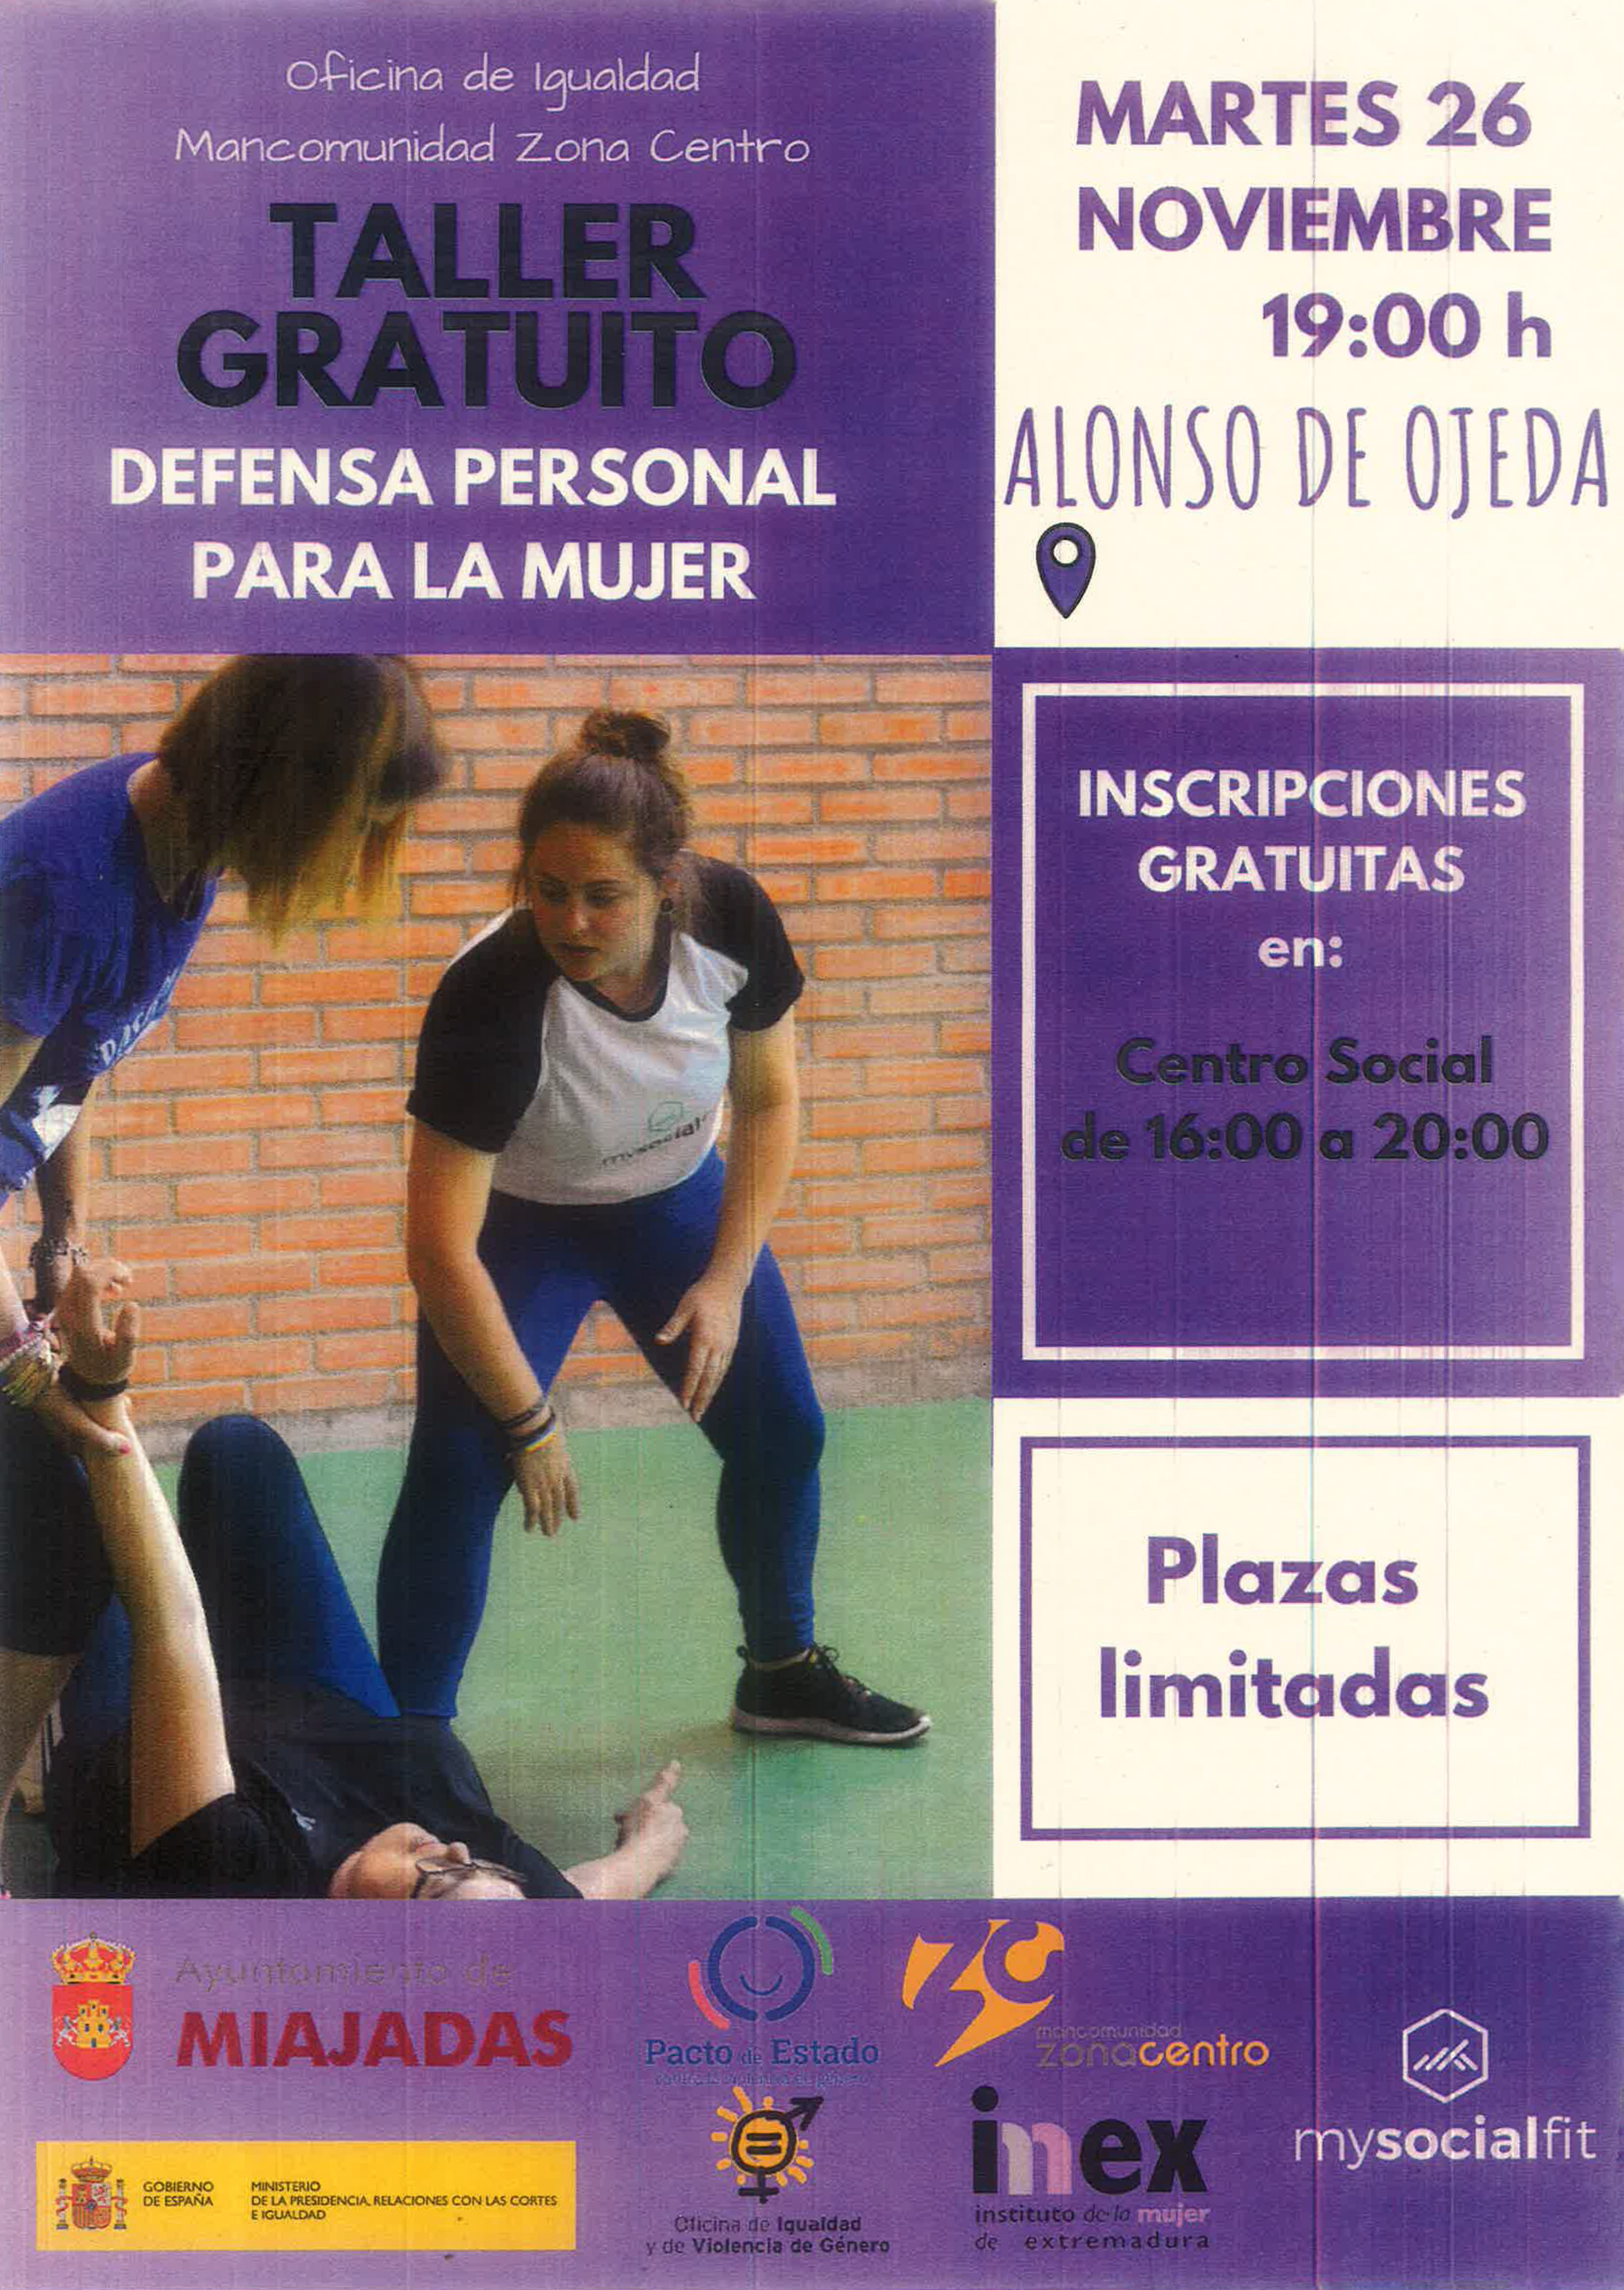 25n19 Alonso de Ojeda